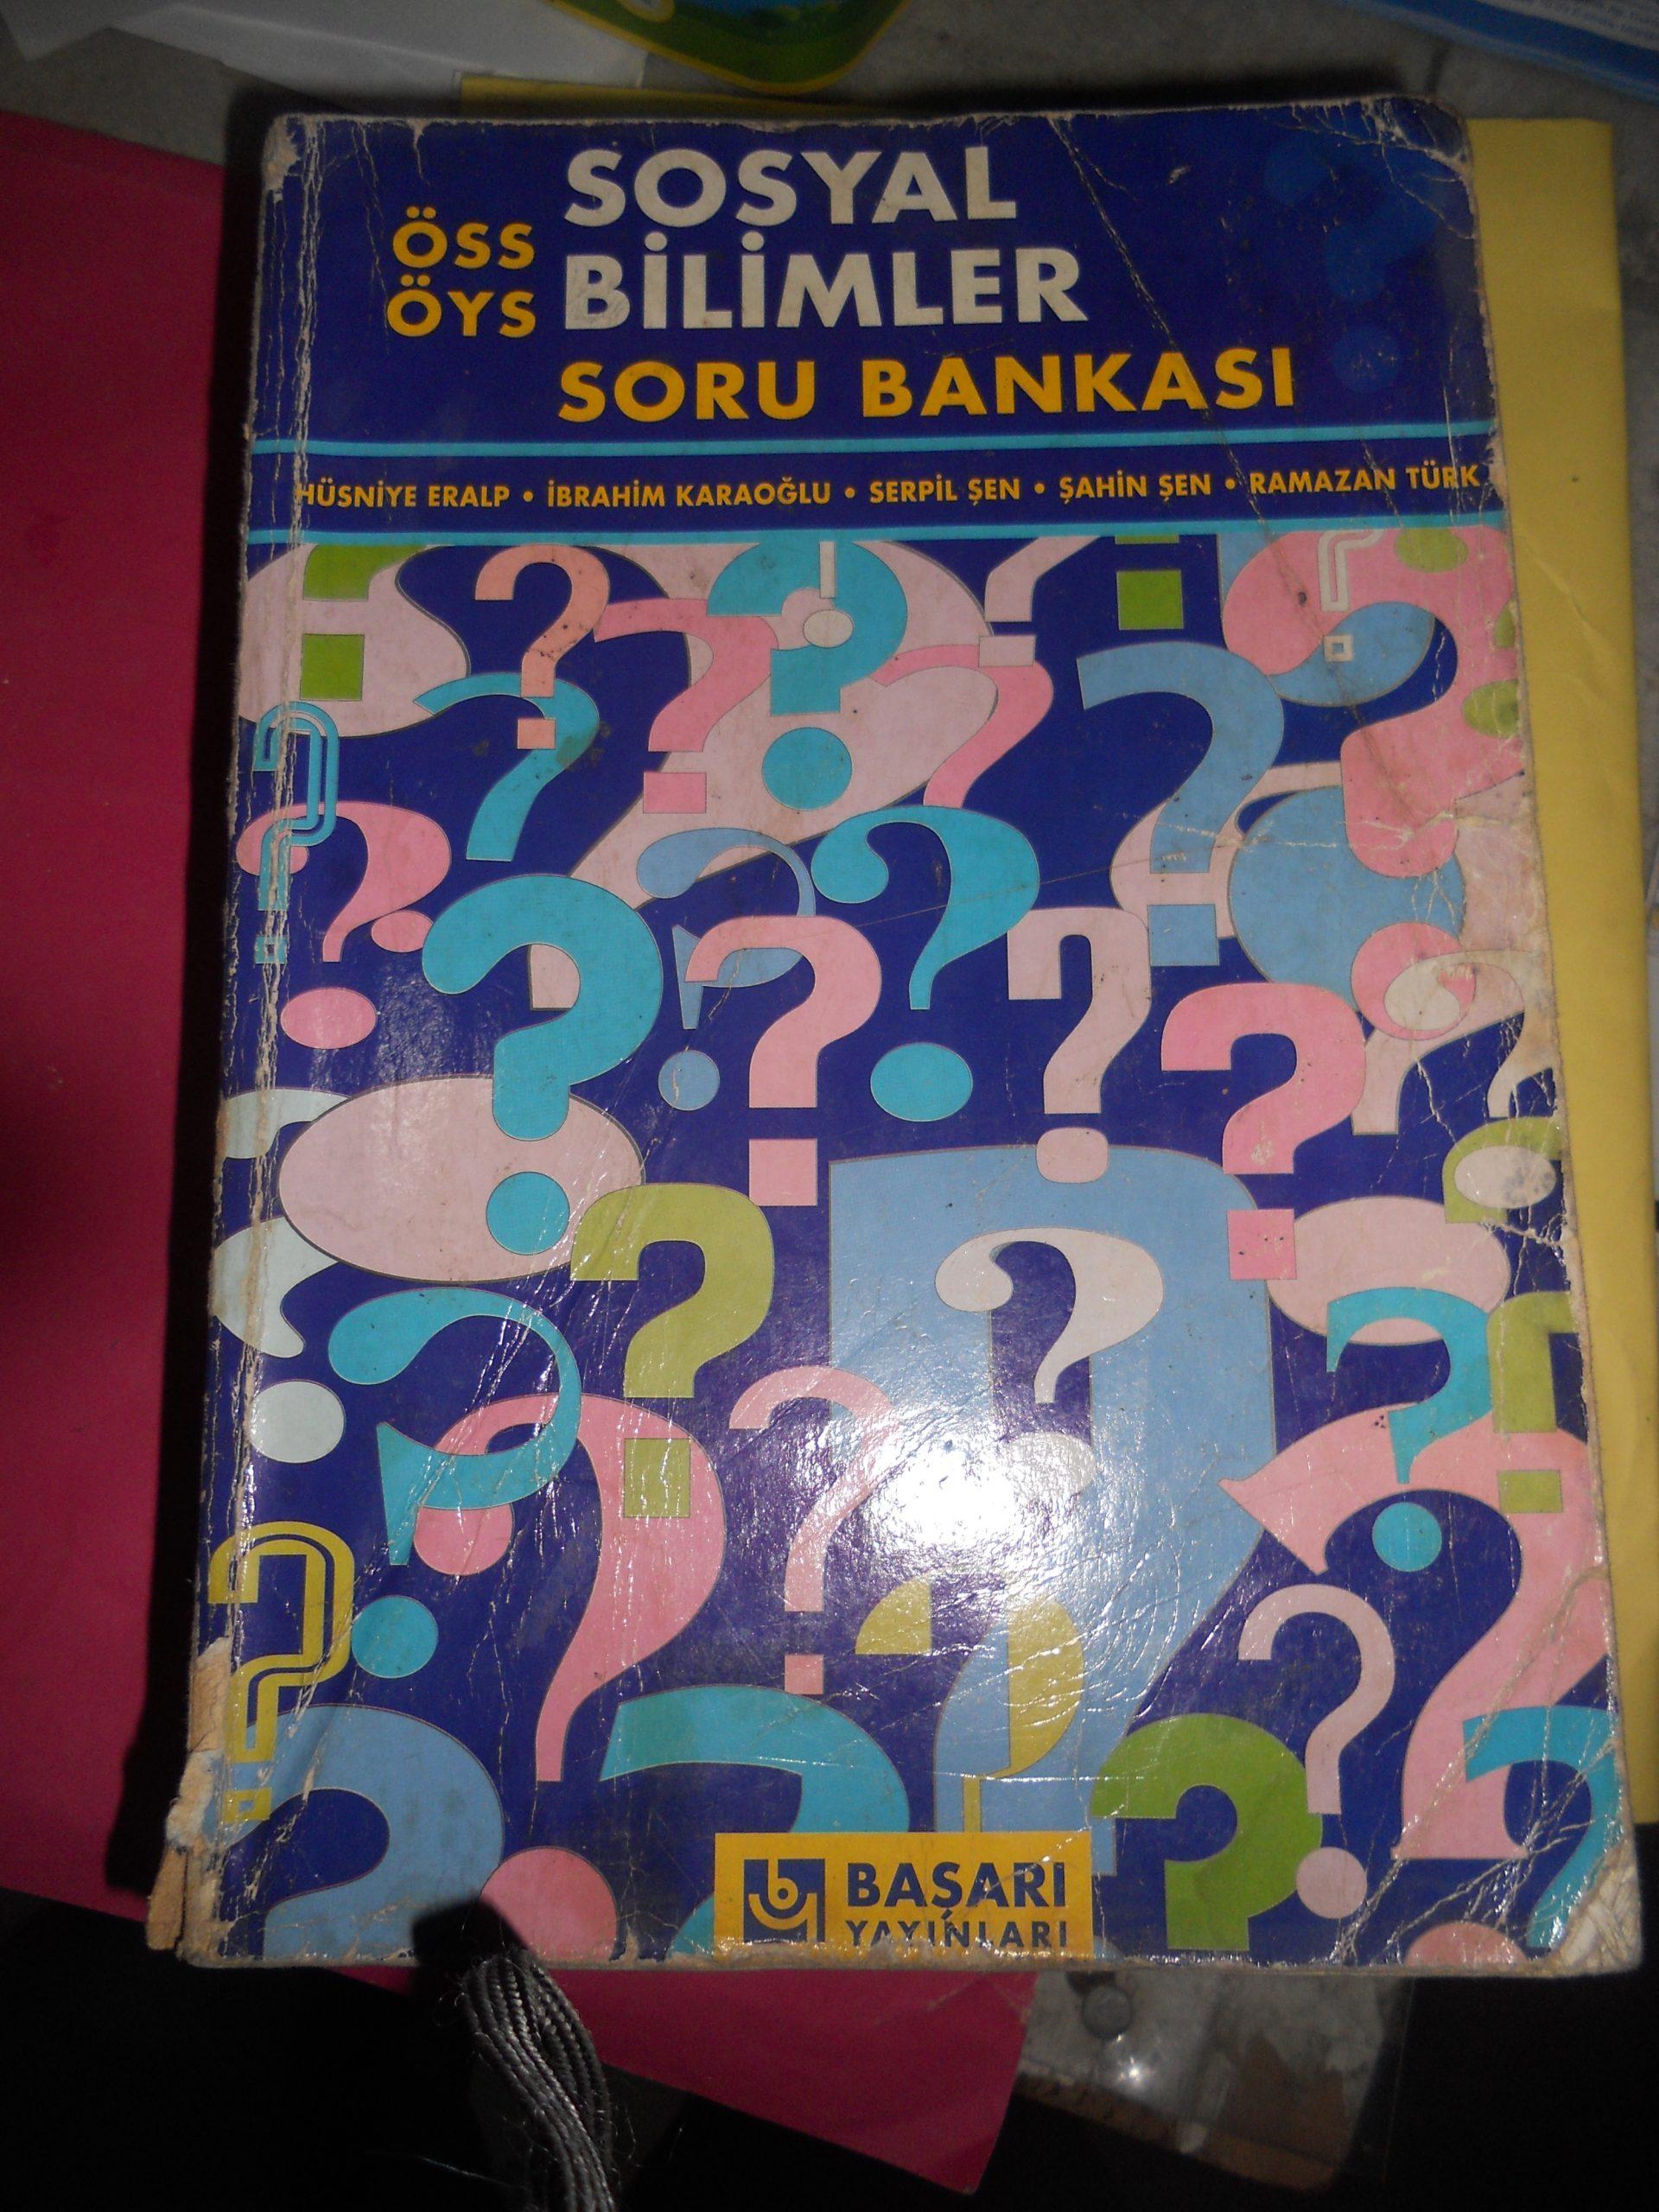 ÖSS -ÖYS SOSYAL BİLİMLER SORU BANKASI/BAŞARI YAY/ 15 TL